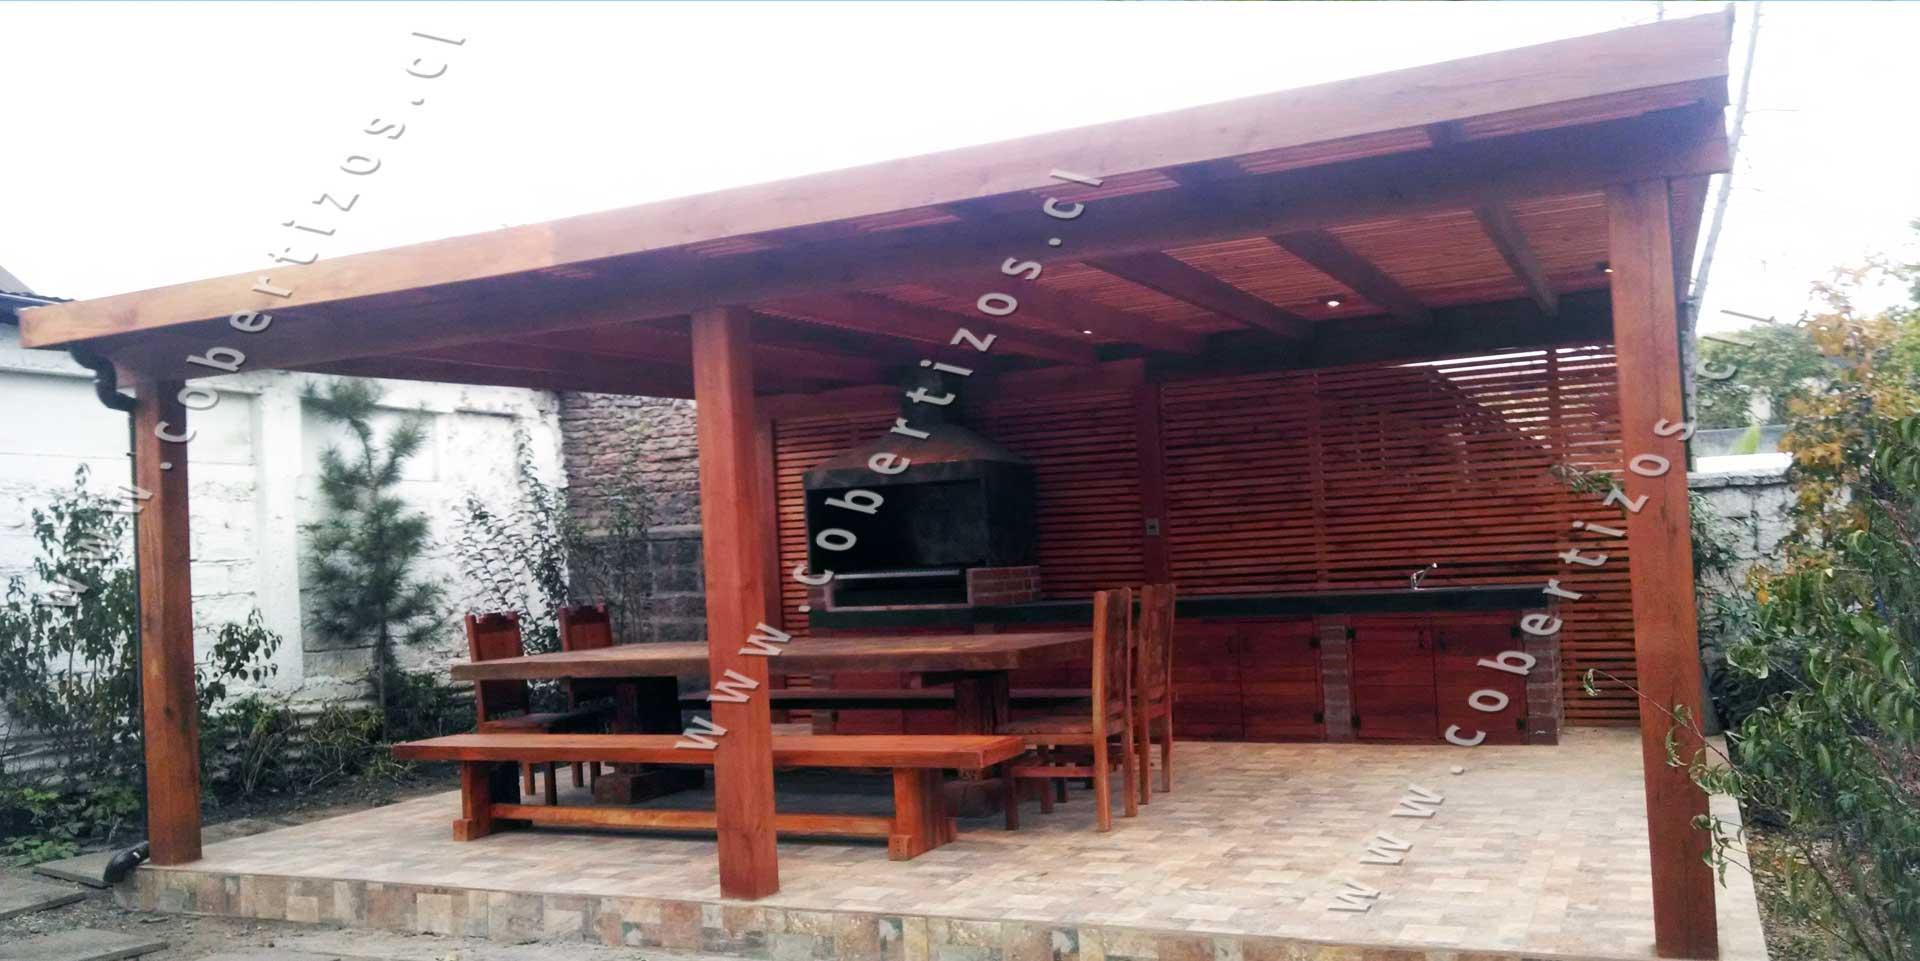 Pergolas de madera techos de terrazas pergolas itamar - Pergolas de madera valencia ...